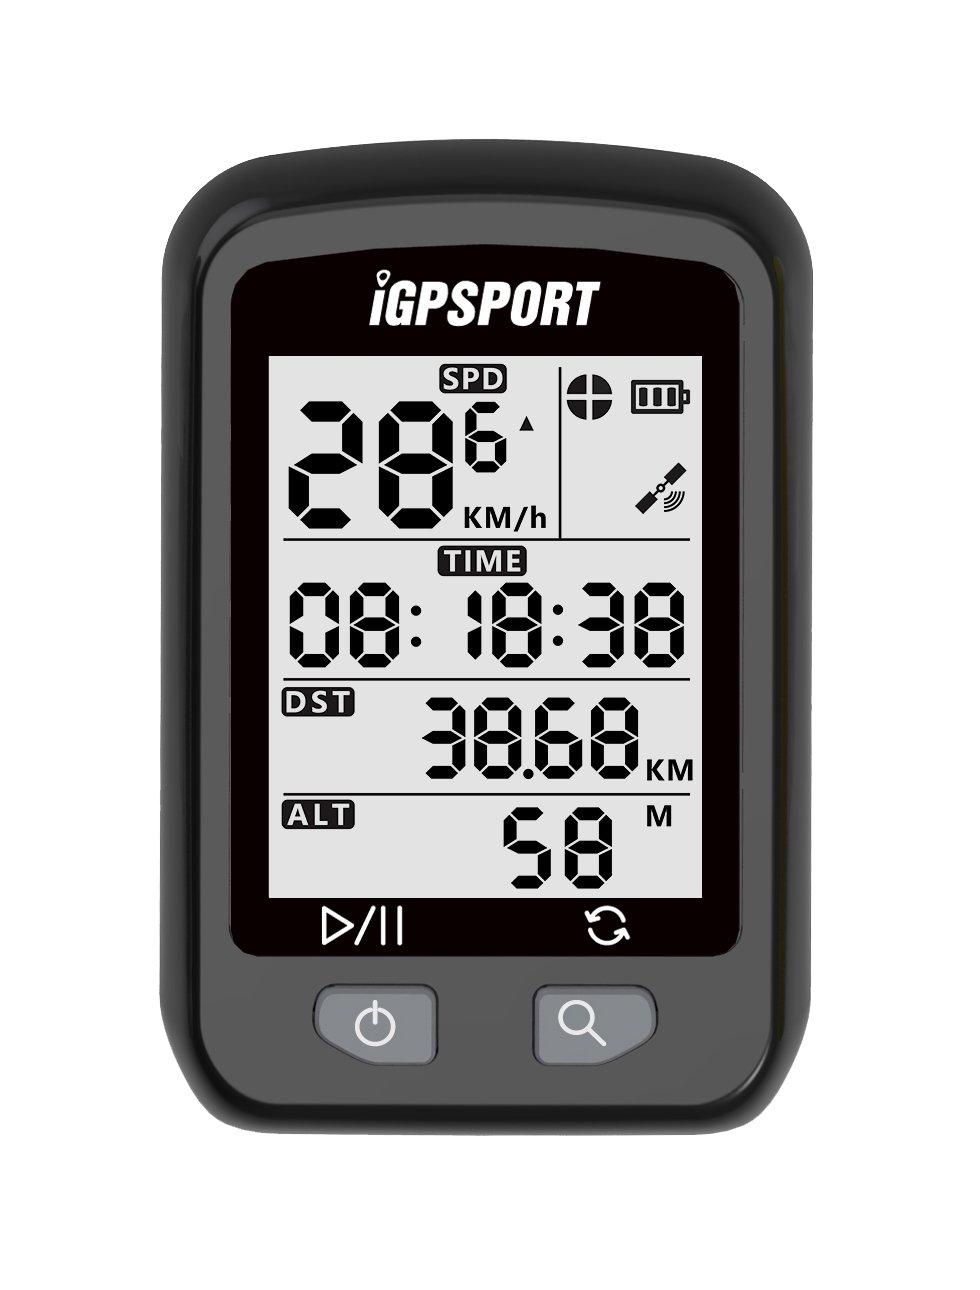 Ciclocomputador con GPS iGPSPORT E inalámbrico impermeable Ordenador de bicicleta